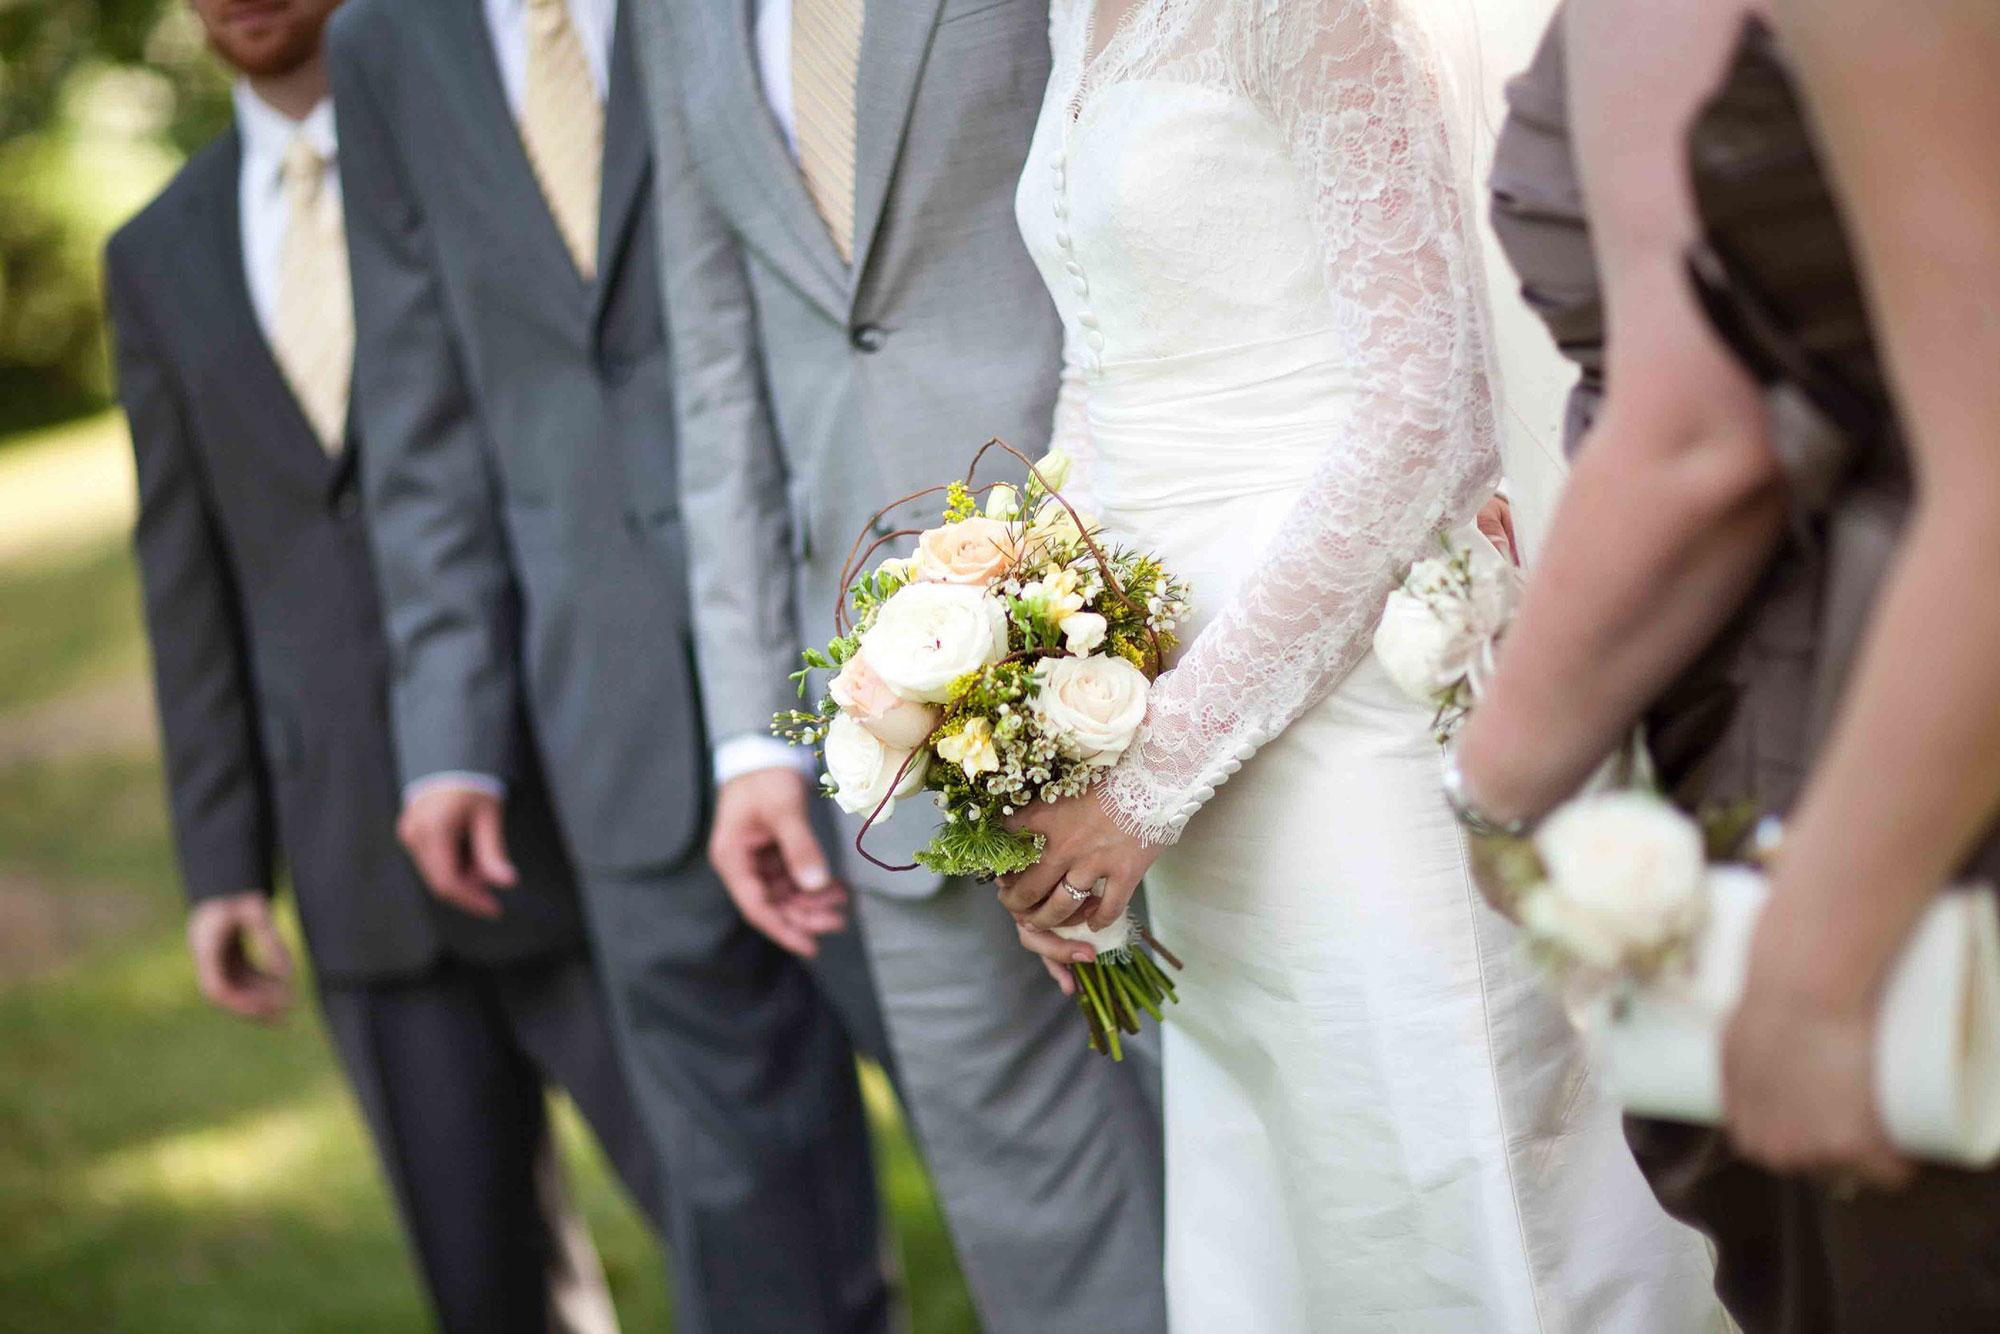 Amanda-Cowley-Willowbank-Vineyard-Bride-Photo-By-White-Photographie-020.jpg